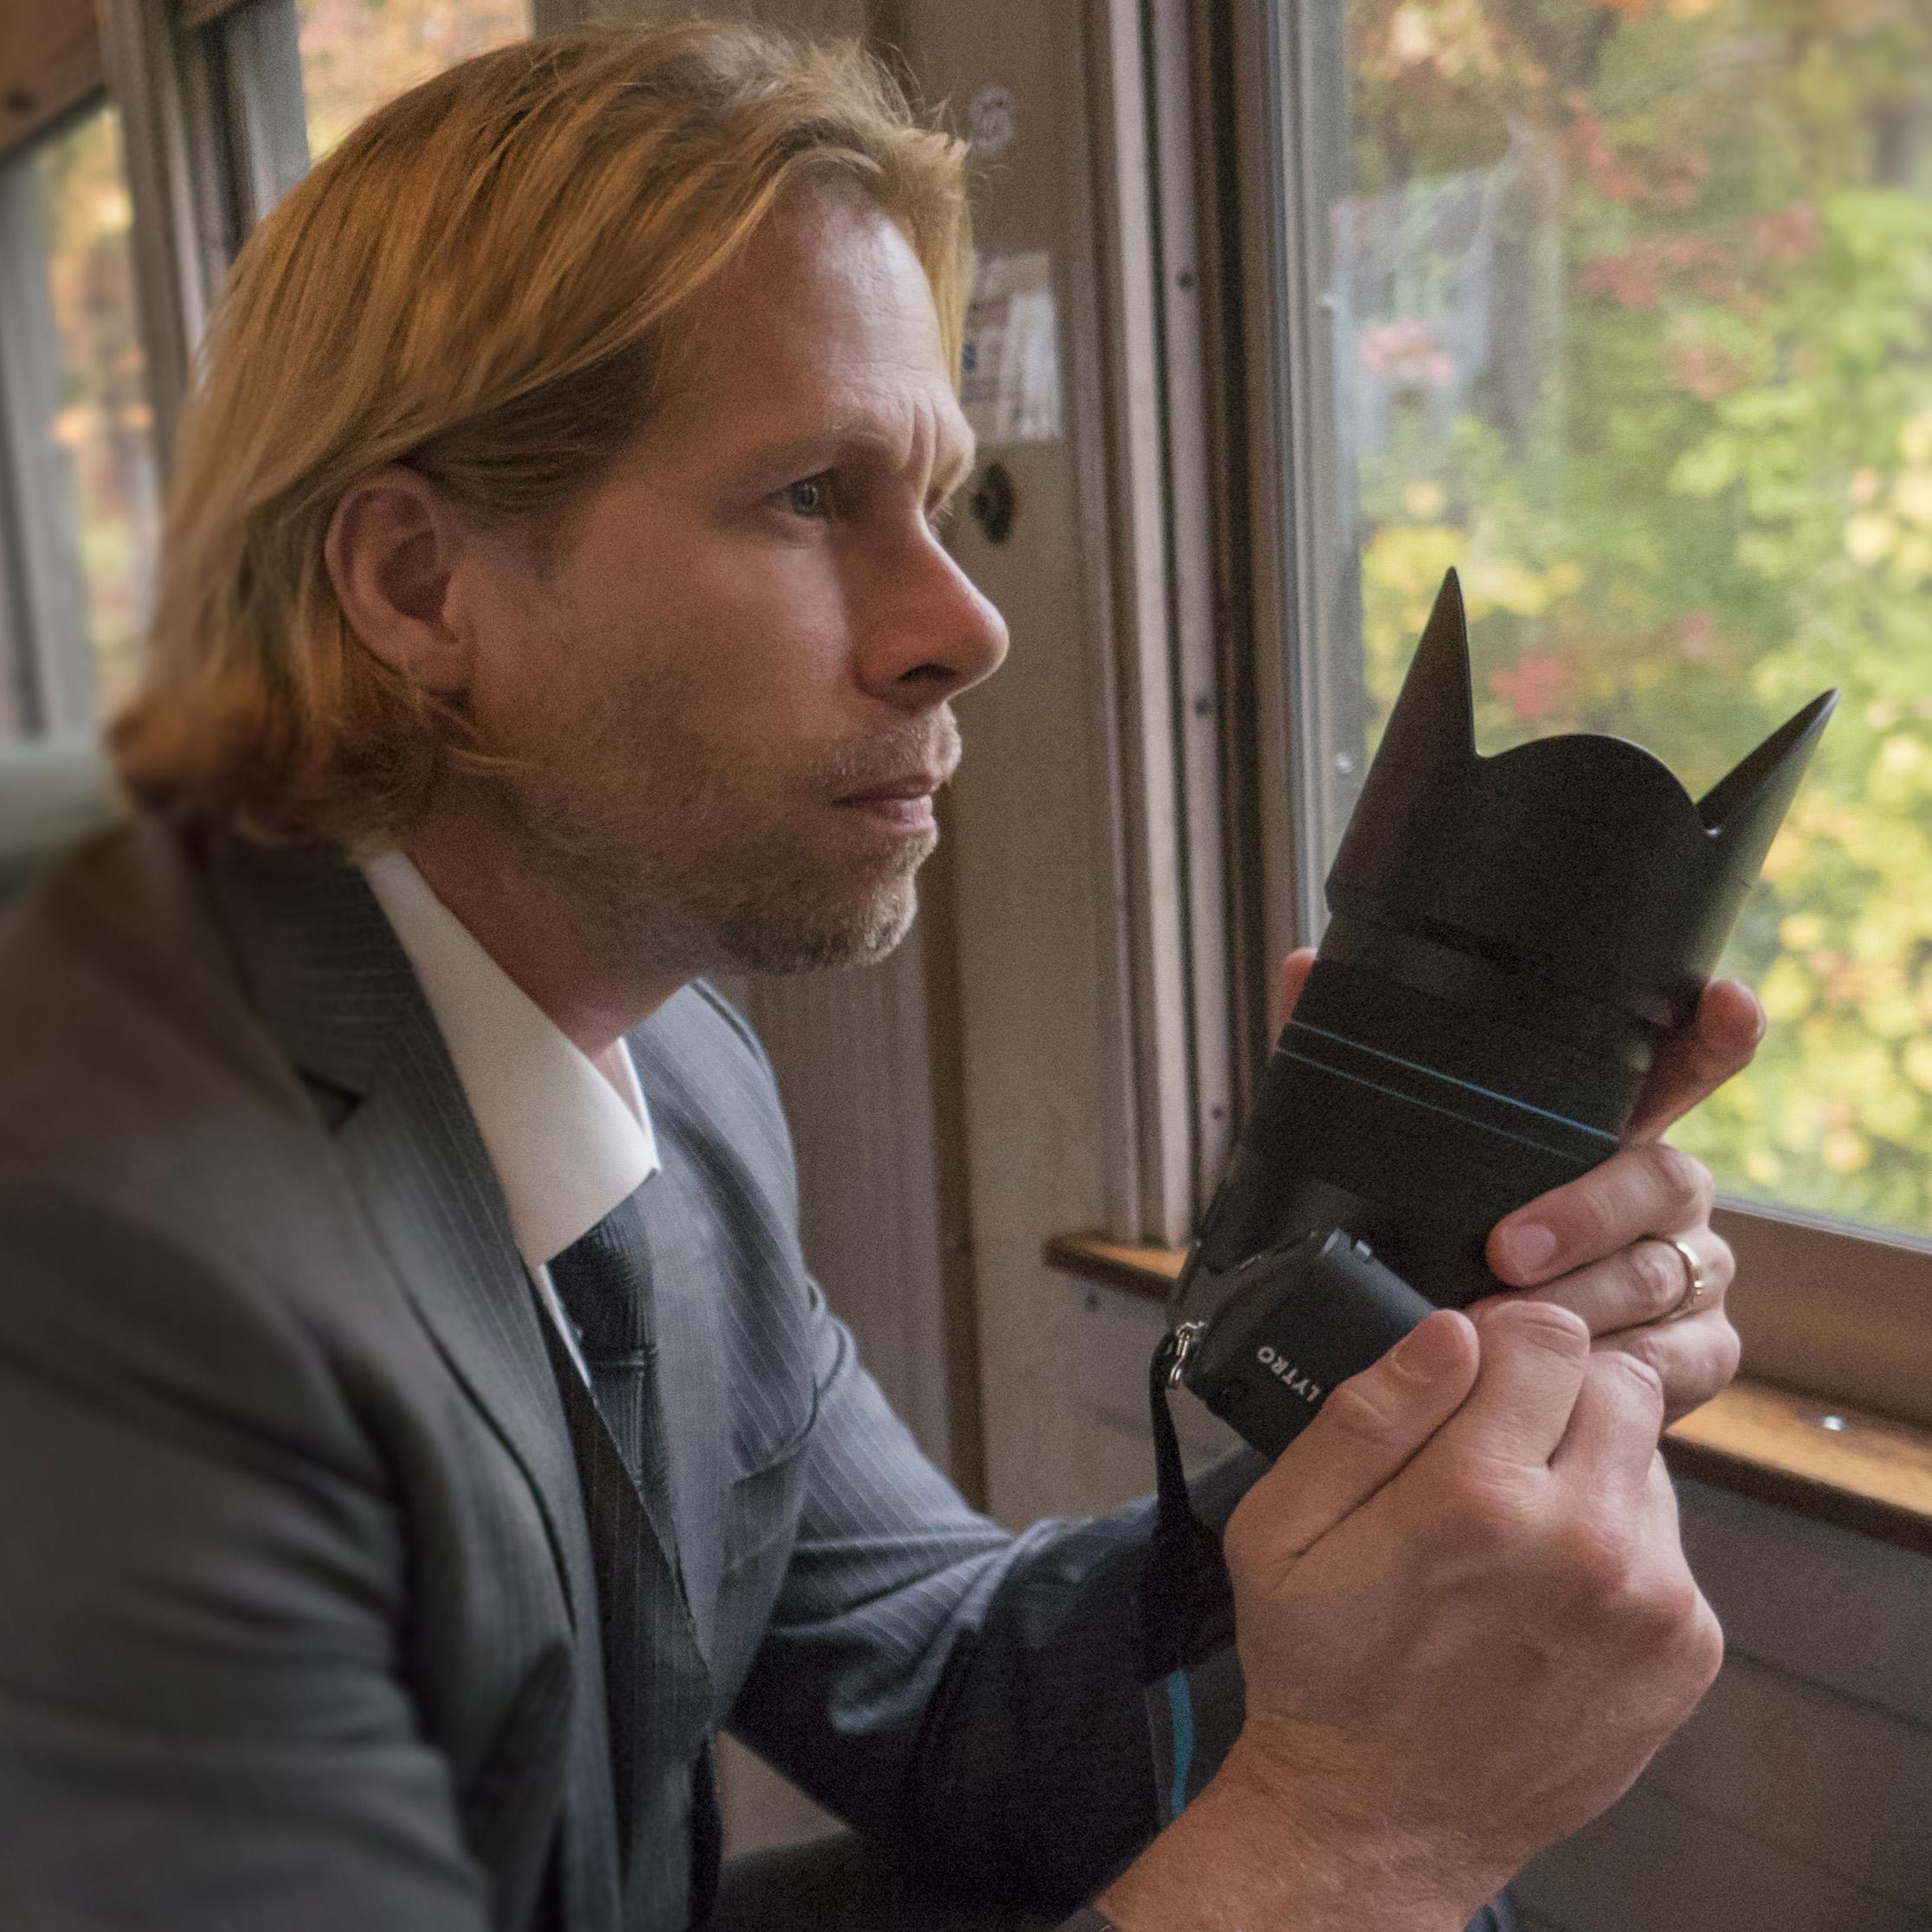 Lytro Illum Photographer